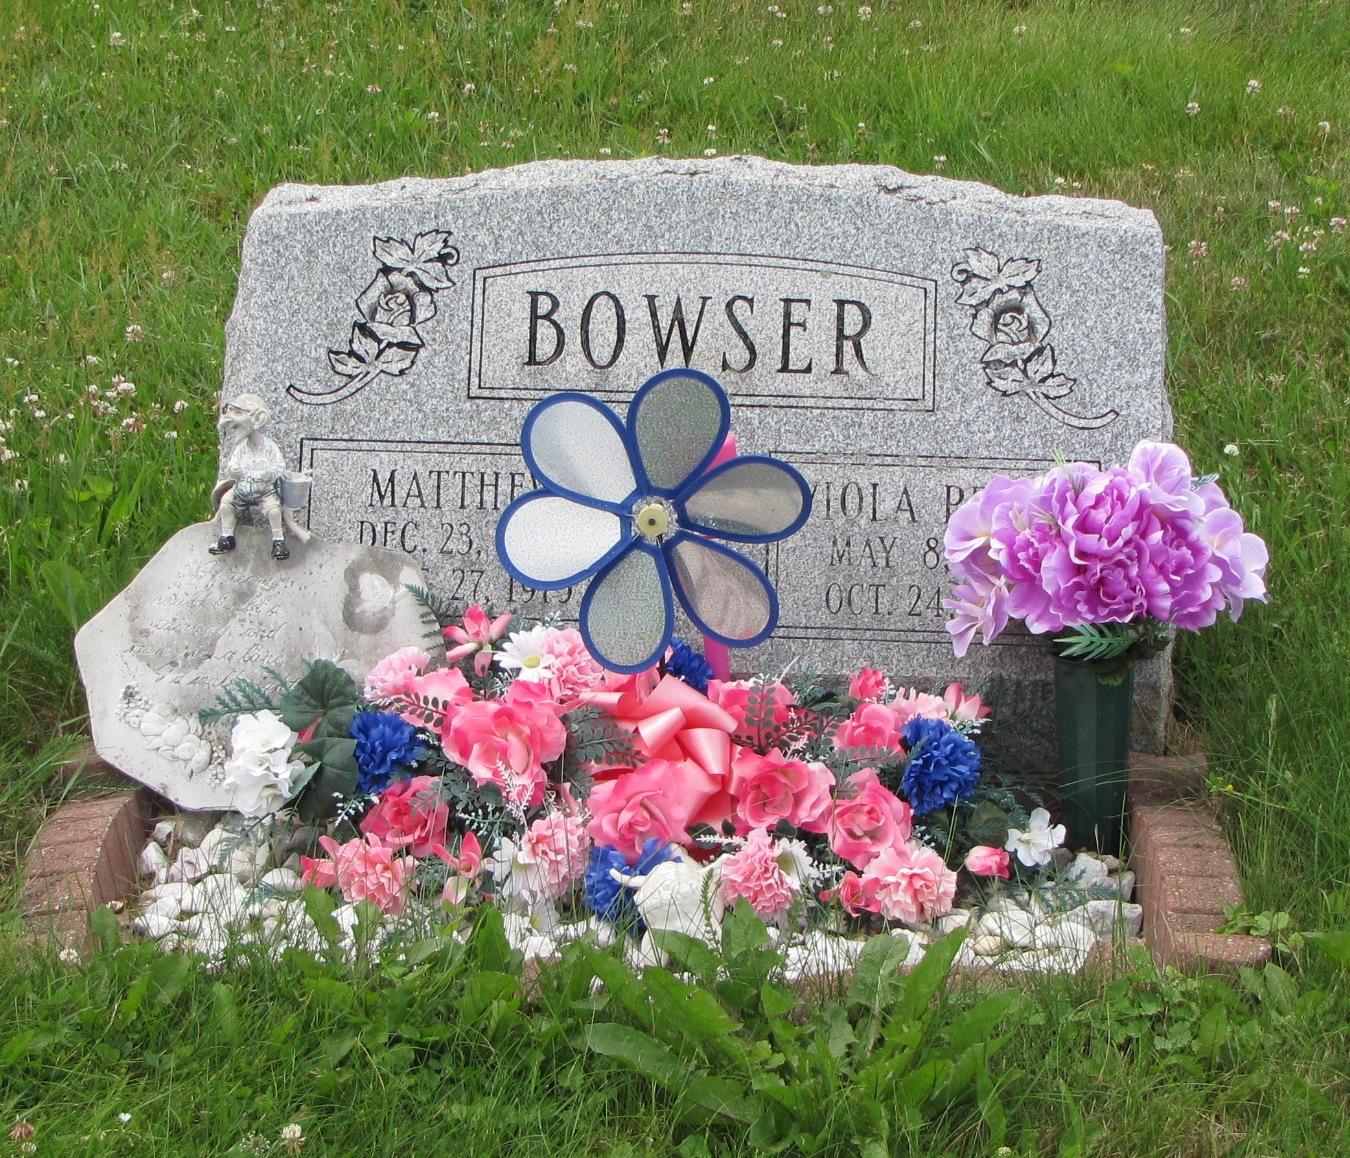 Matthew Bowser